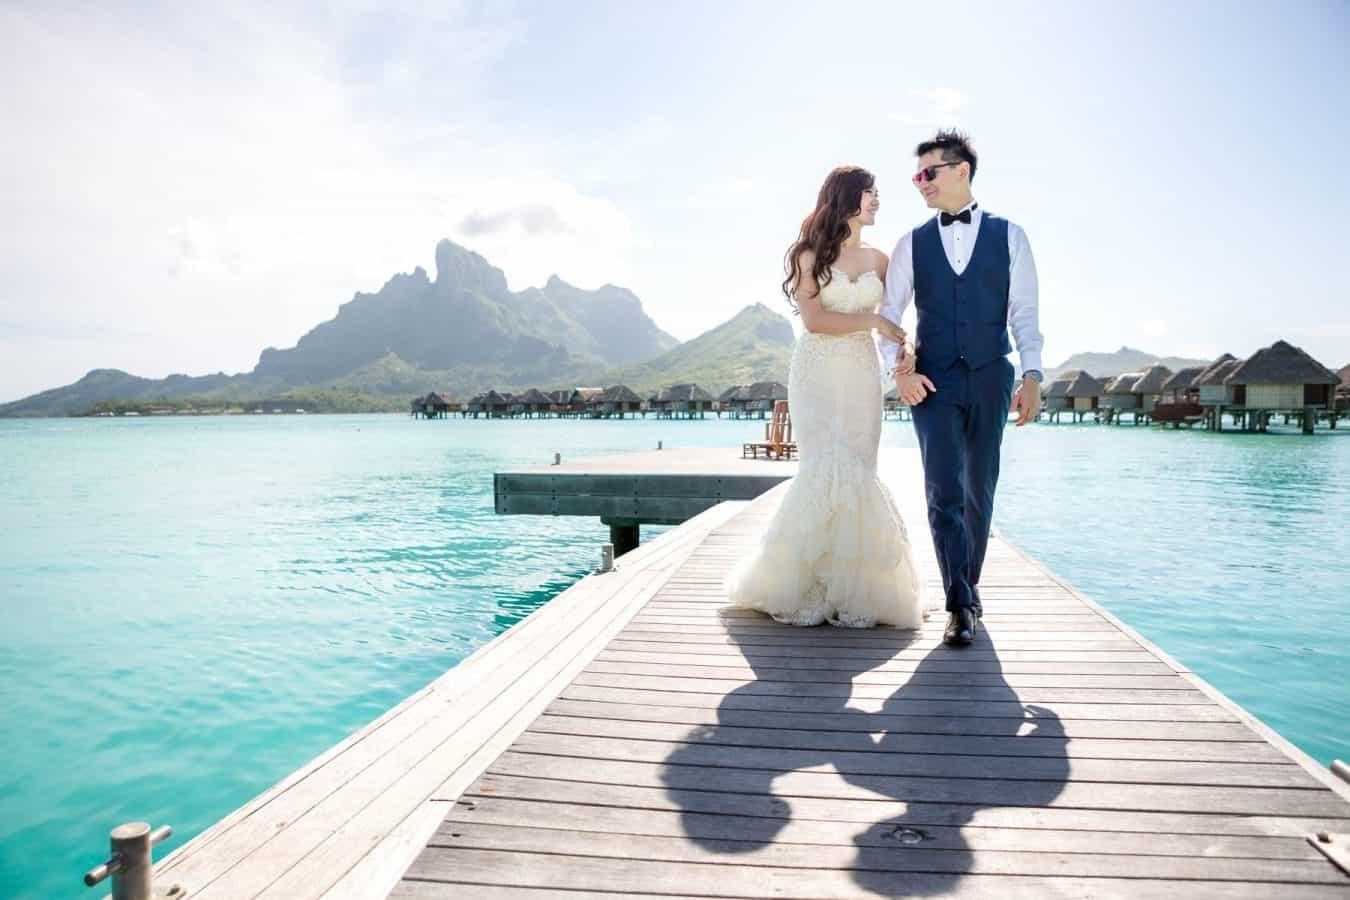 Damien Goburn - Bora Bora Wedding Photographer shooting a happy couple